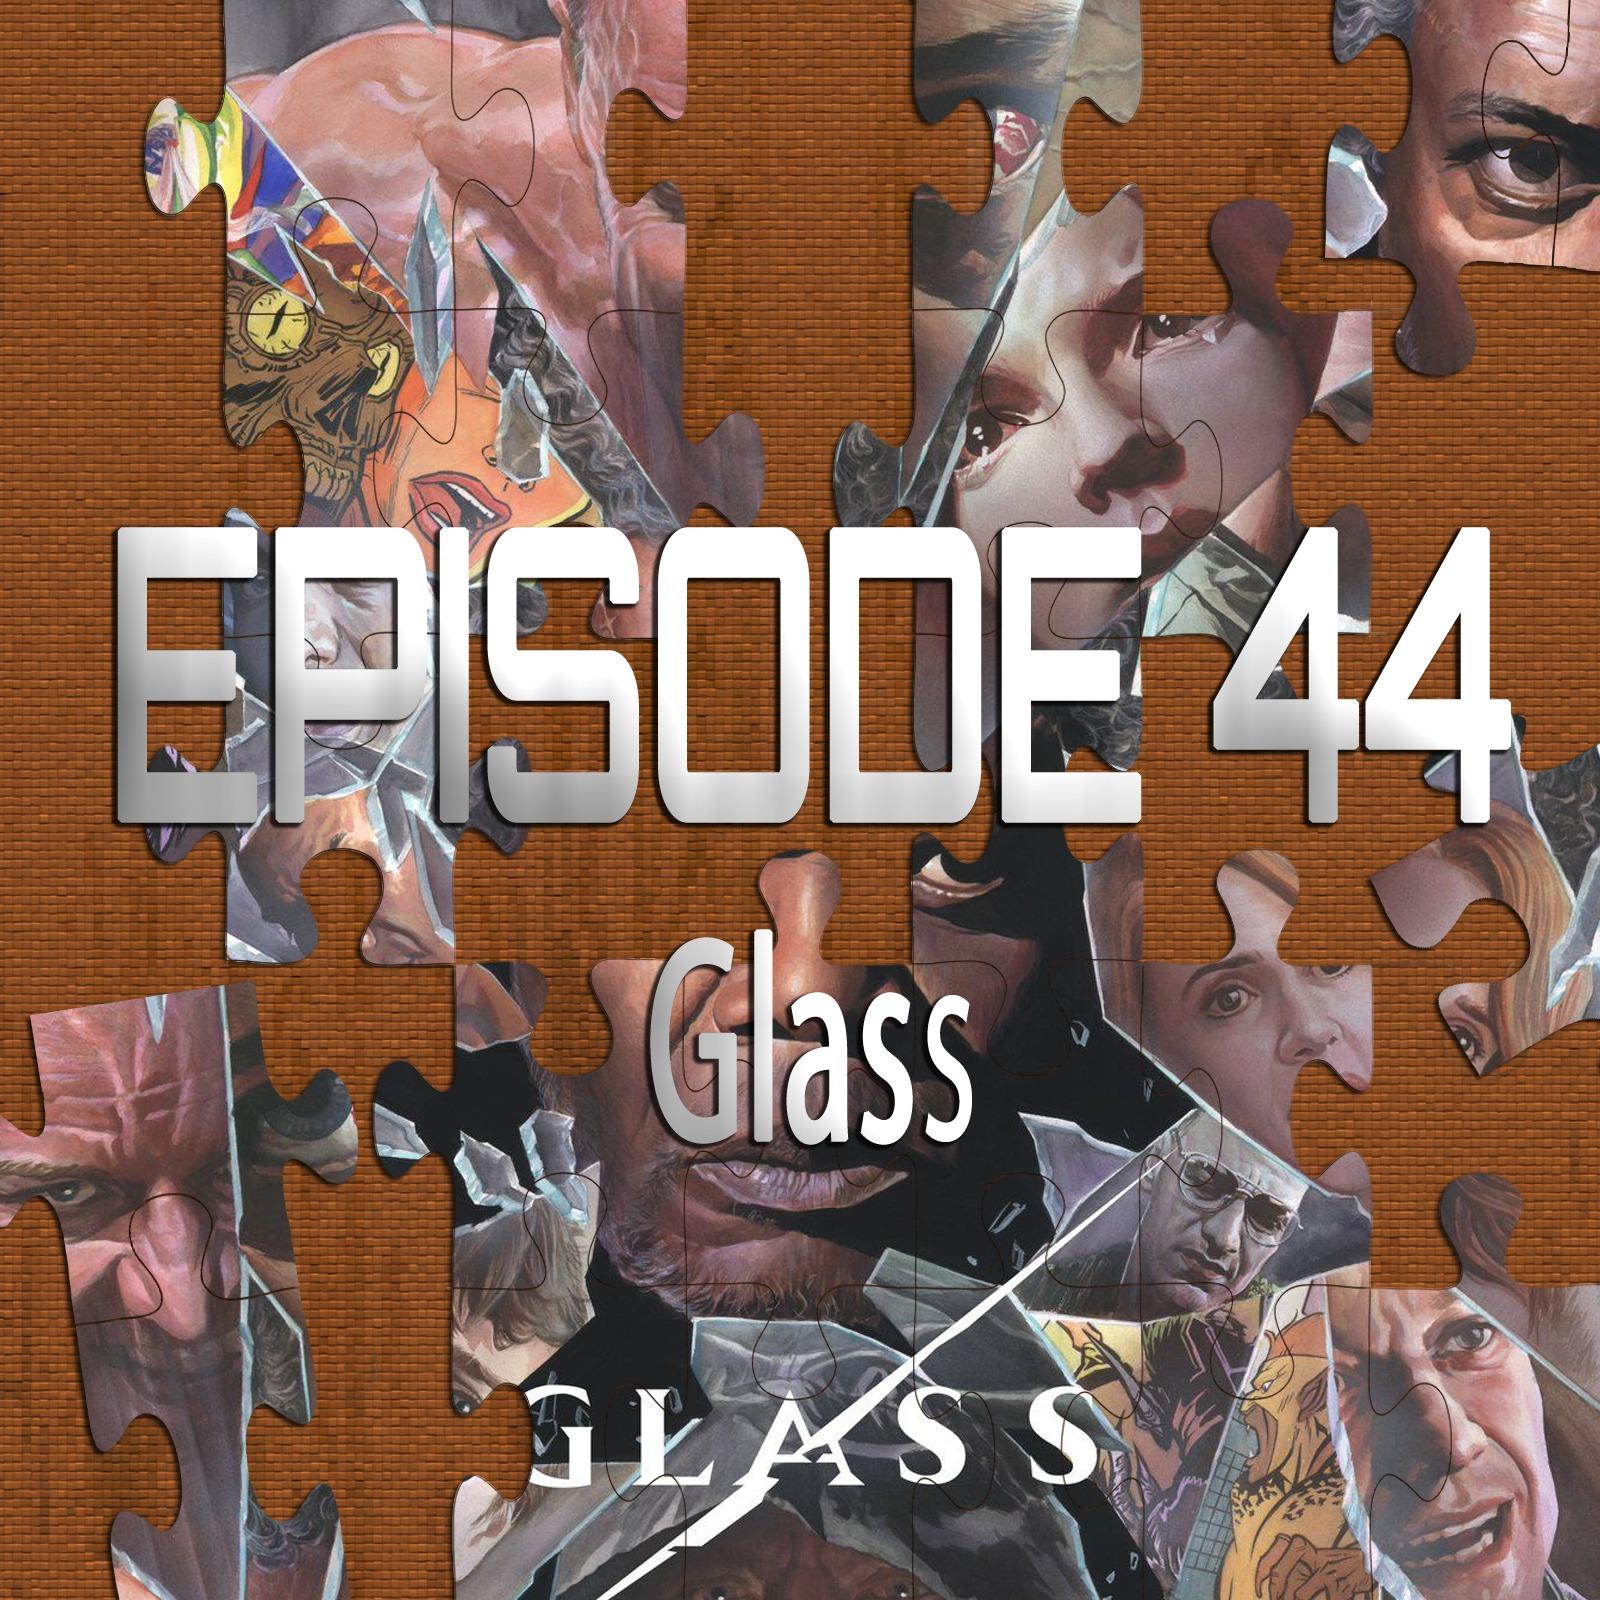 Glass (Featuring Chad Clinton Freeman and Ryan Daugherty)